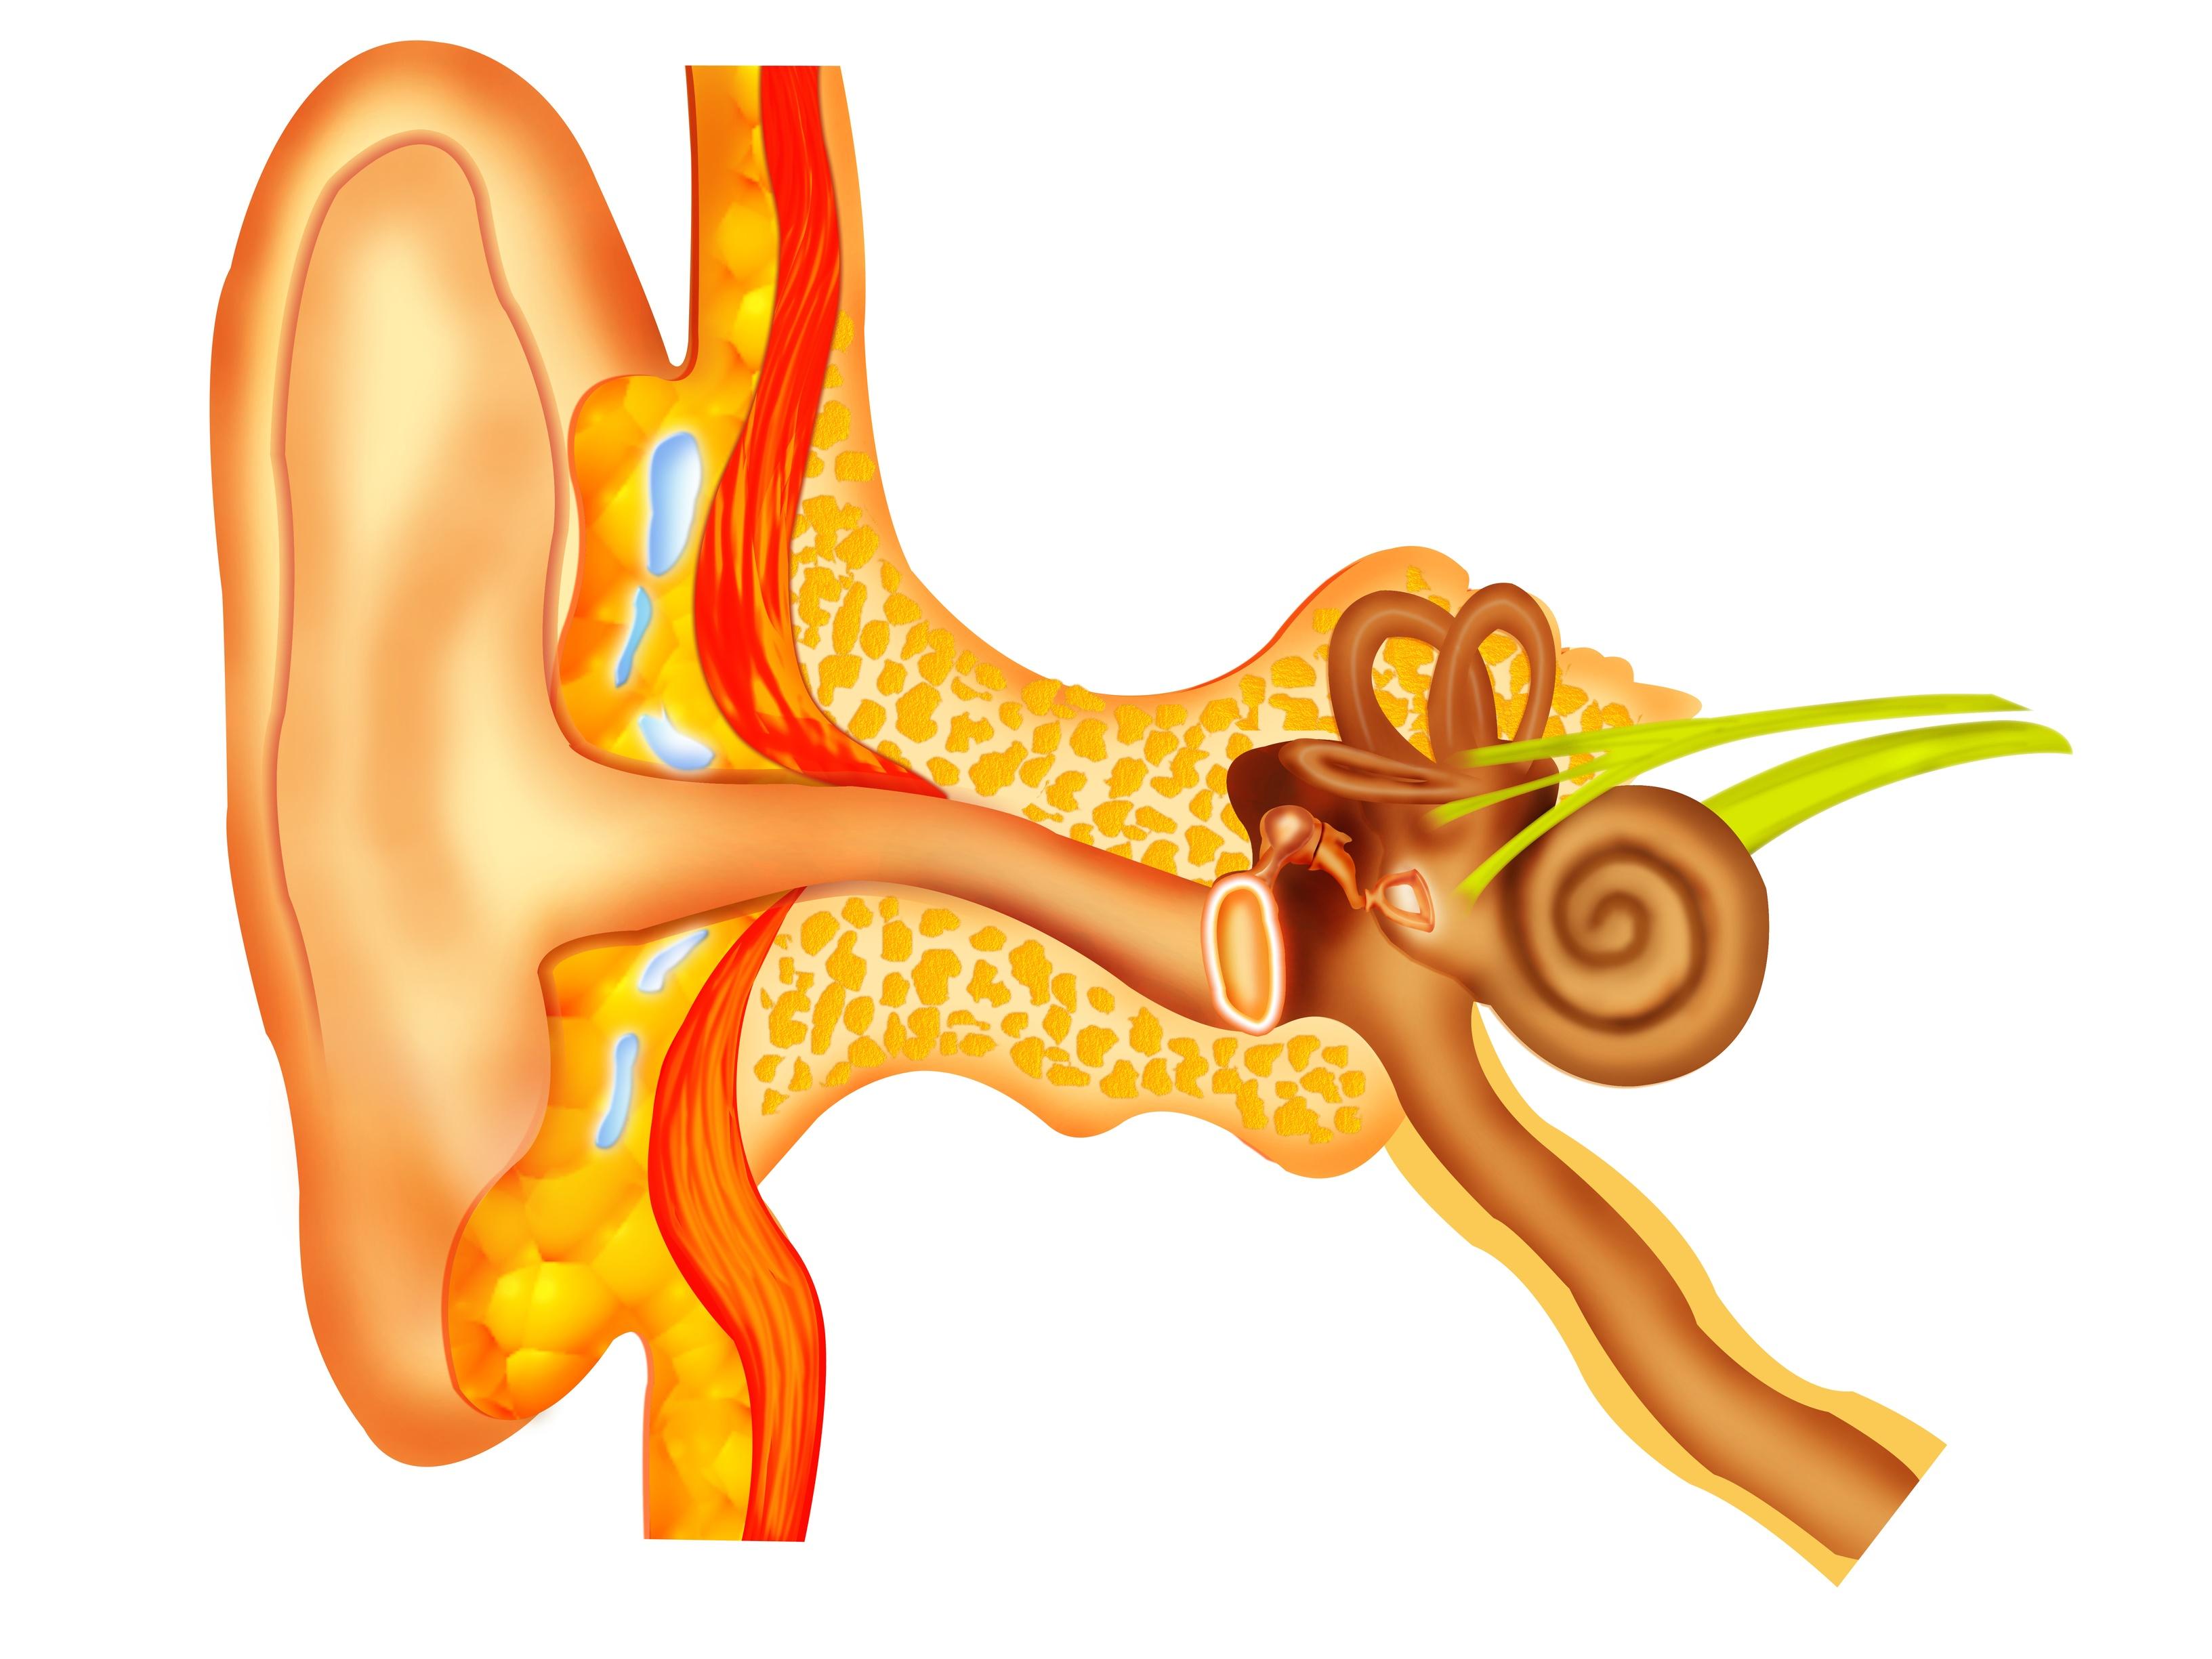 Eardrum repair